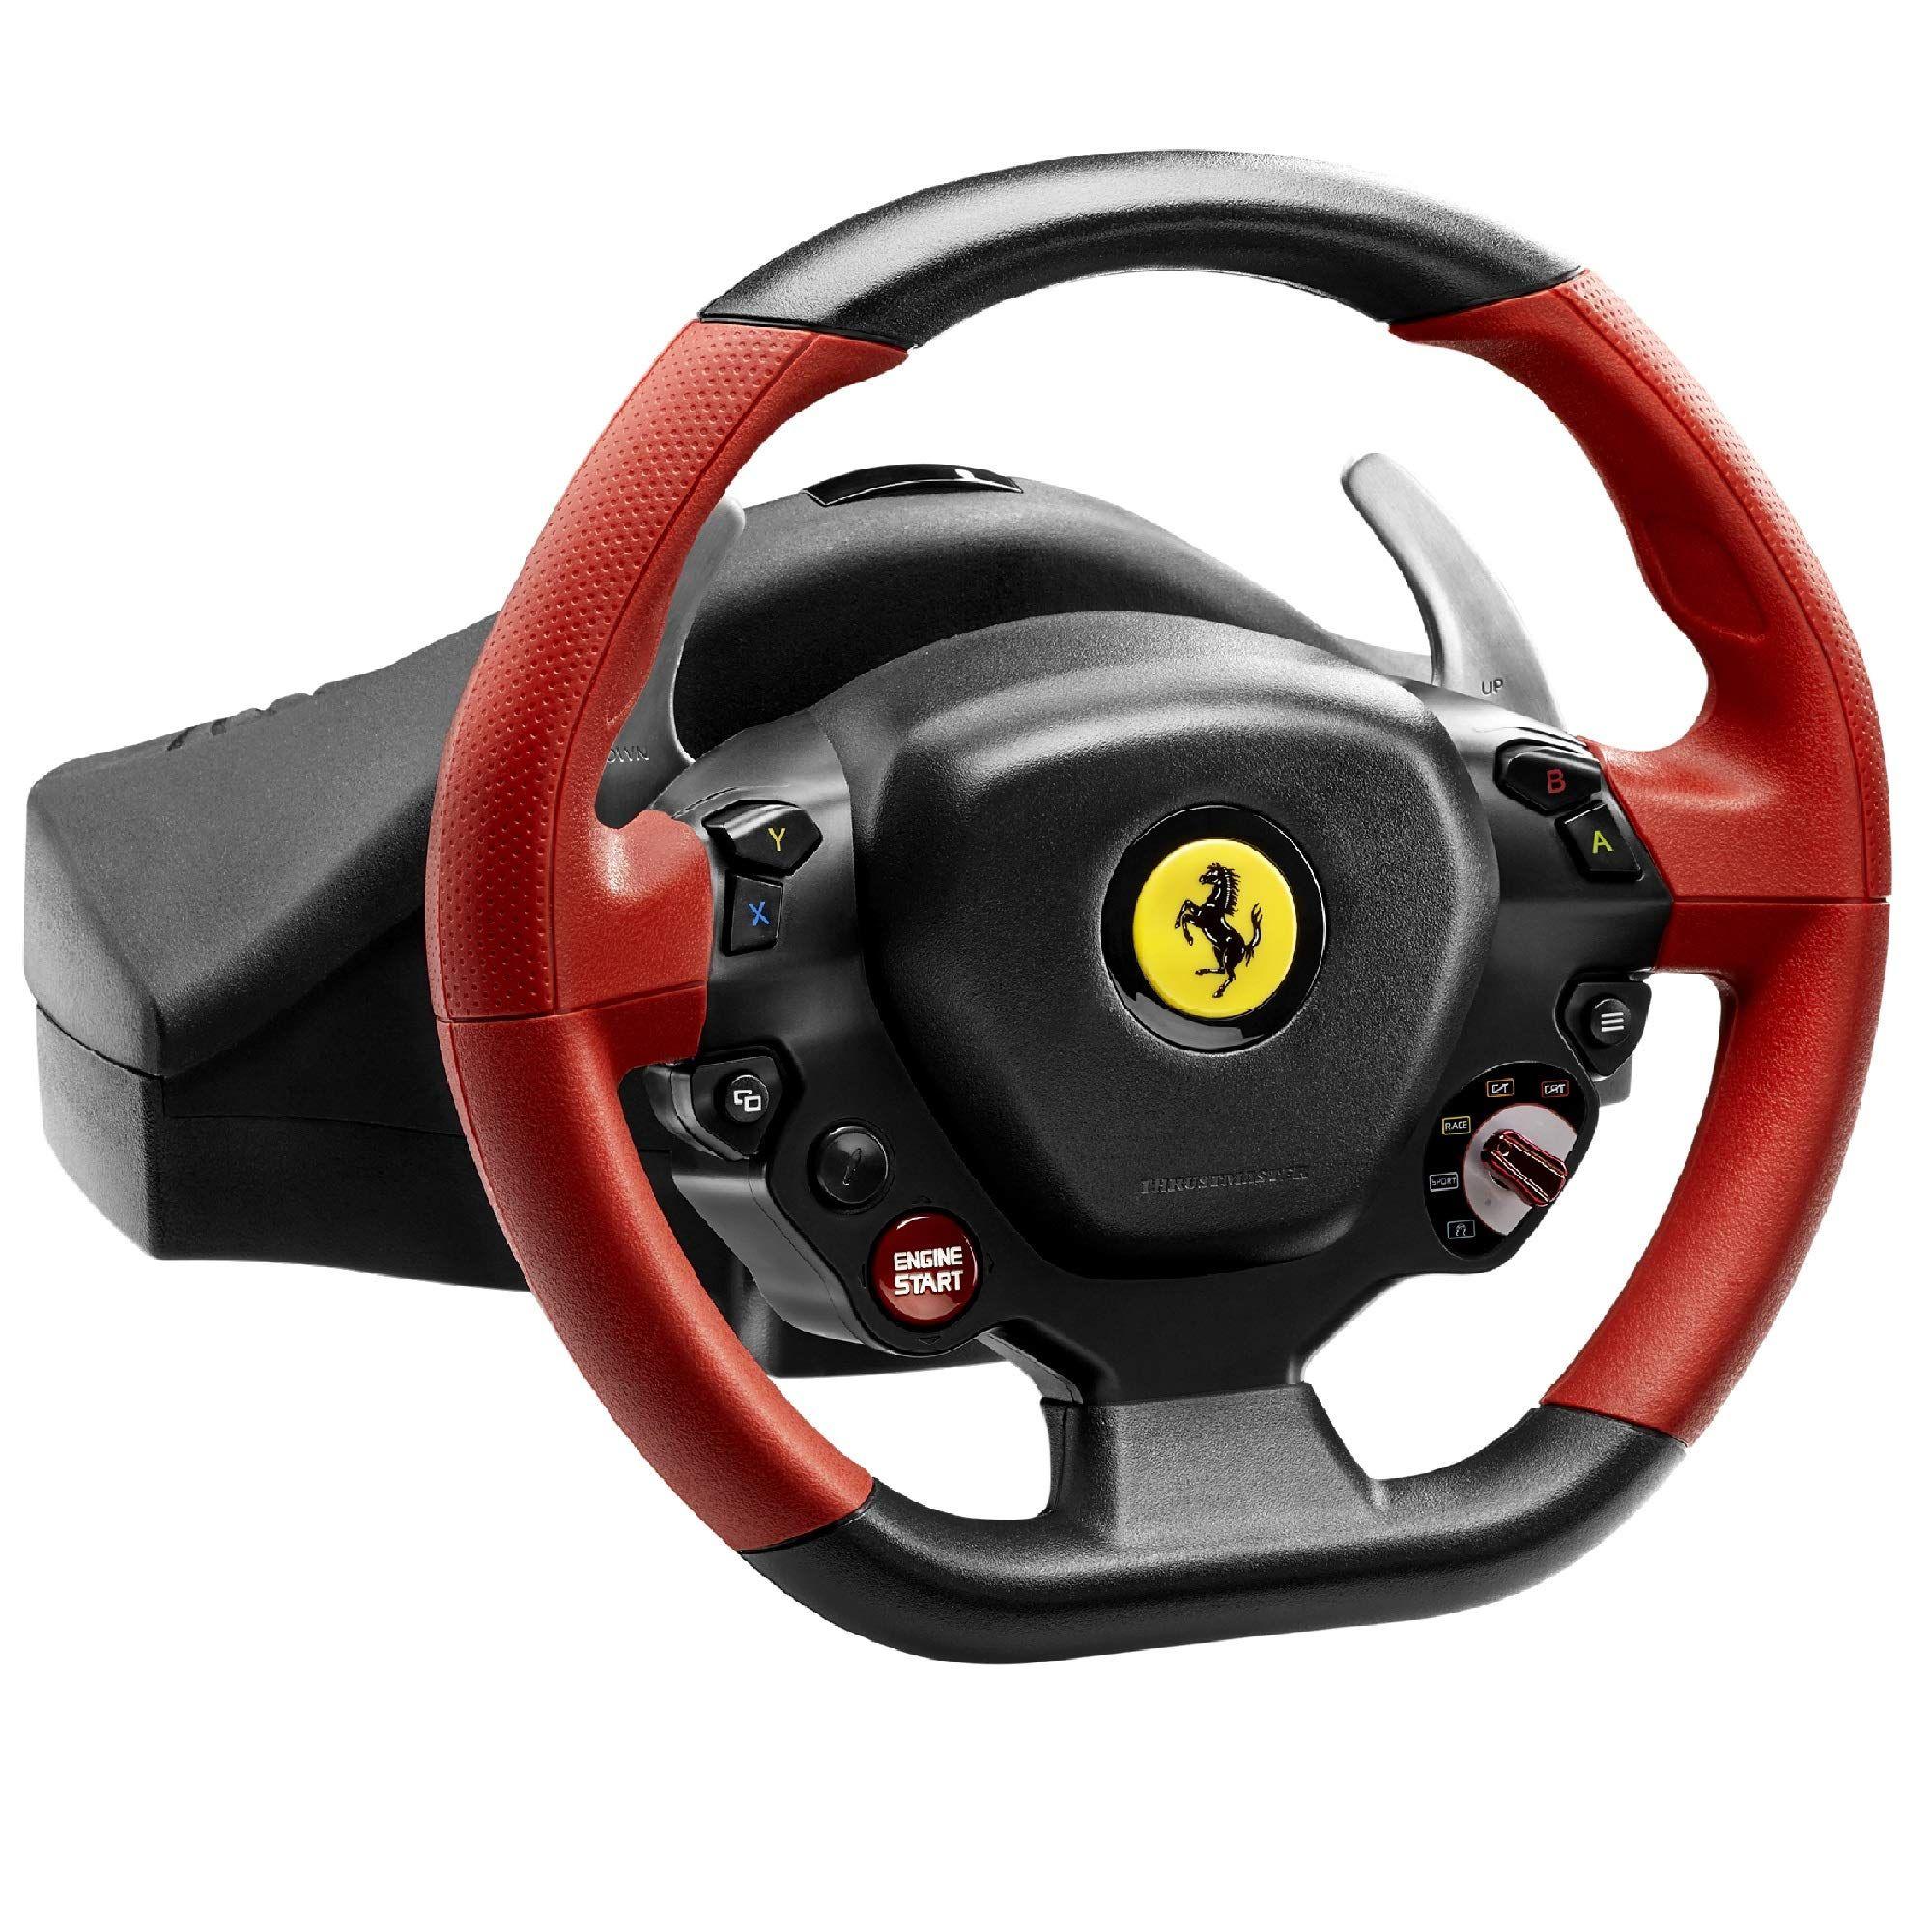 Thrustmaster Ferrari 458 Spider Racing Wheel For Xbox One Ferrari